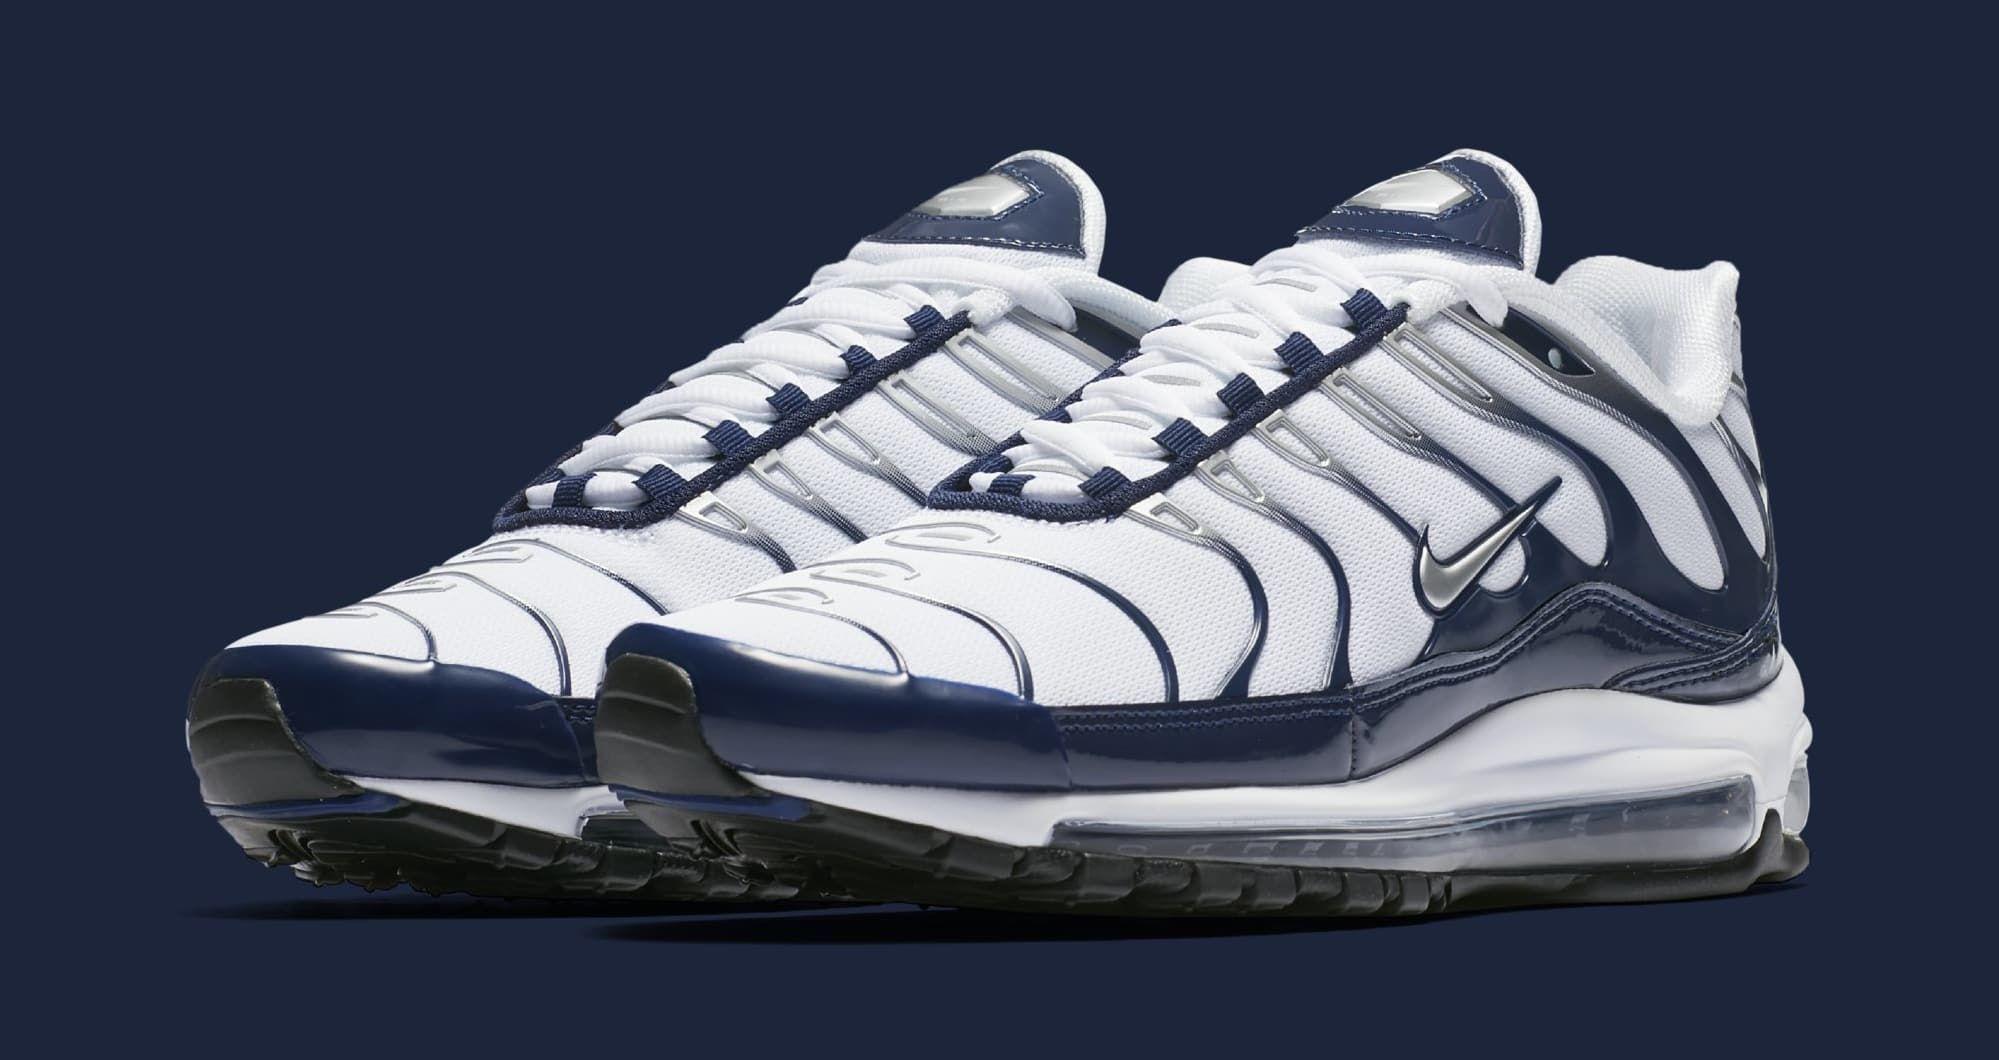 Nike Air Max '95 'Blue Spark' Eneste samler  Sole Collector